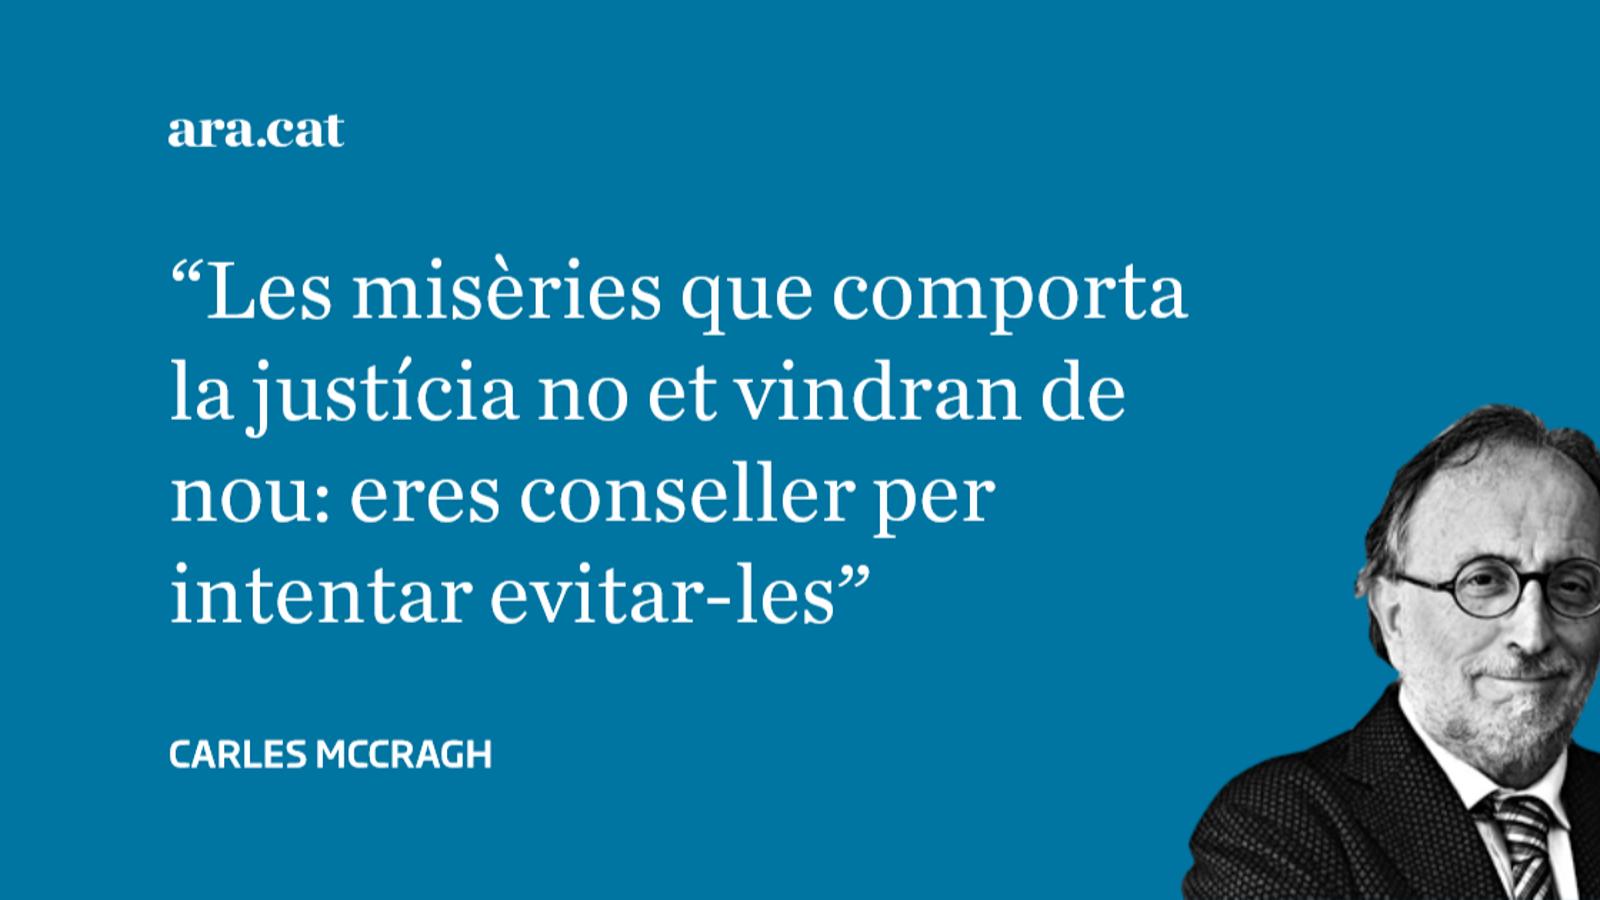 Carta oberta al conseller Carles Mundó